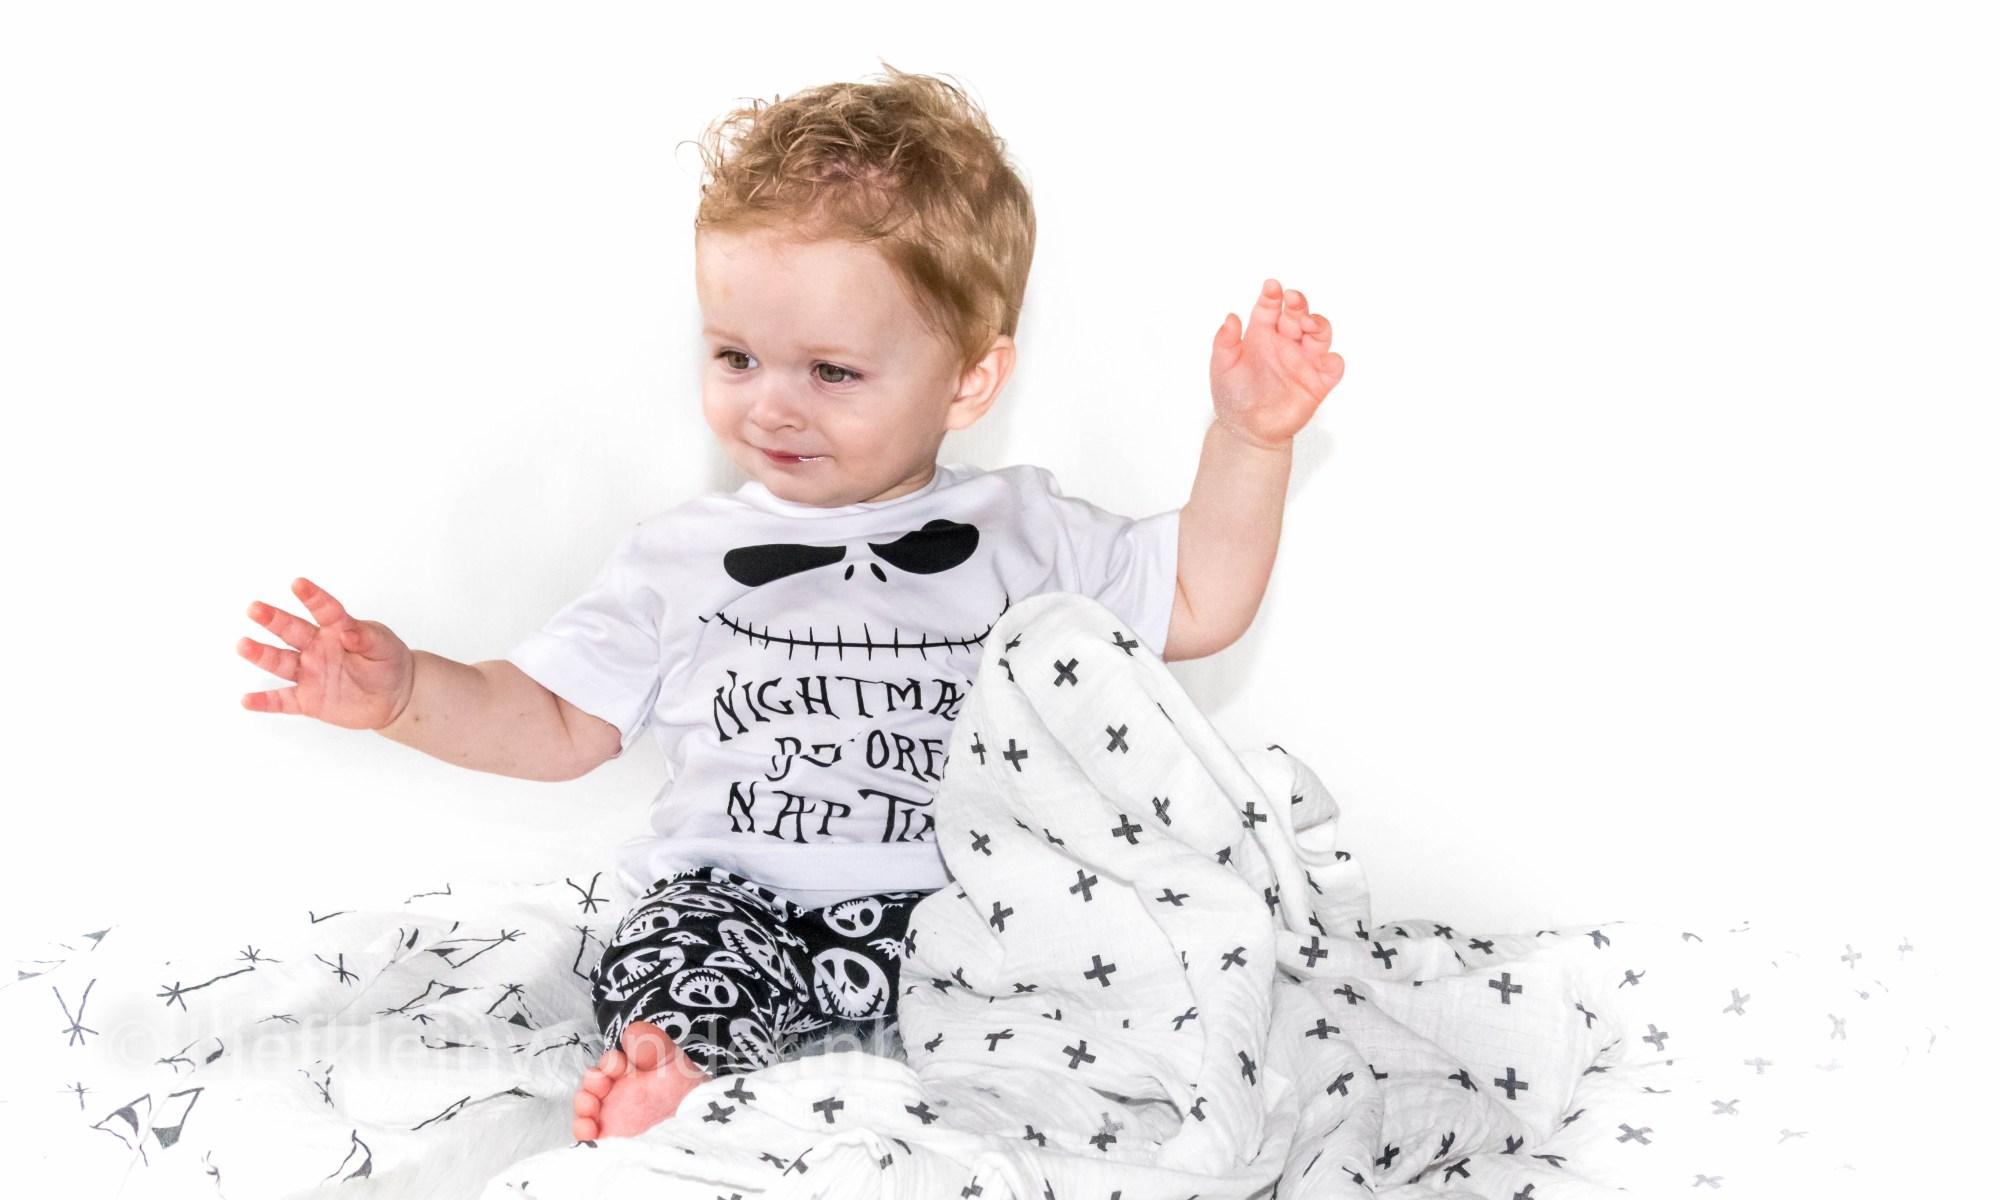 AliExpress babykleding - hydrofiel doeken XL tipi tent kruisjes pijlen